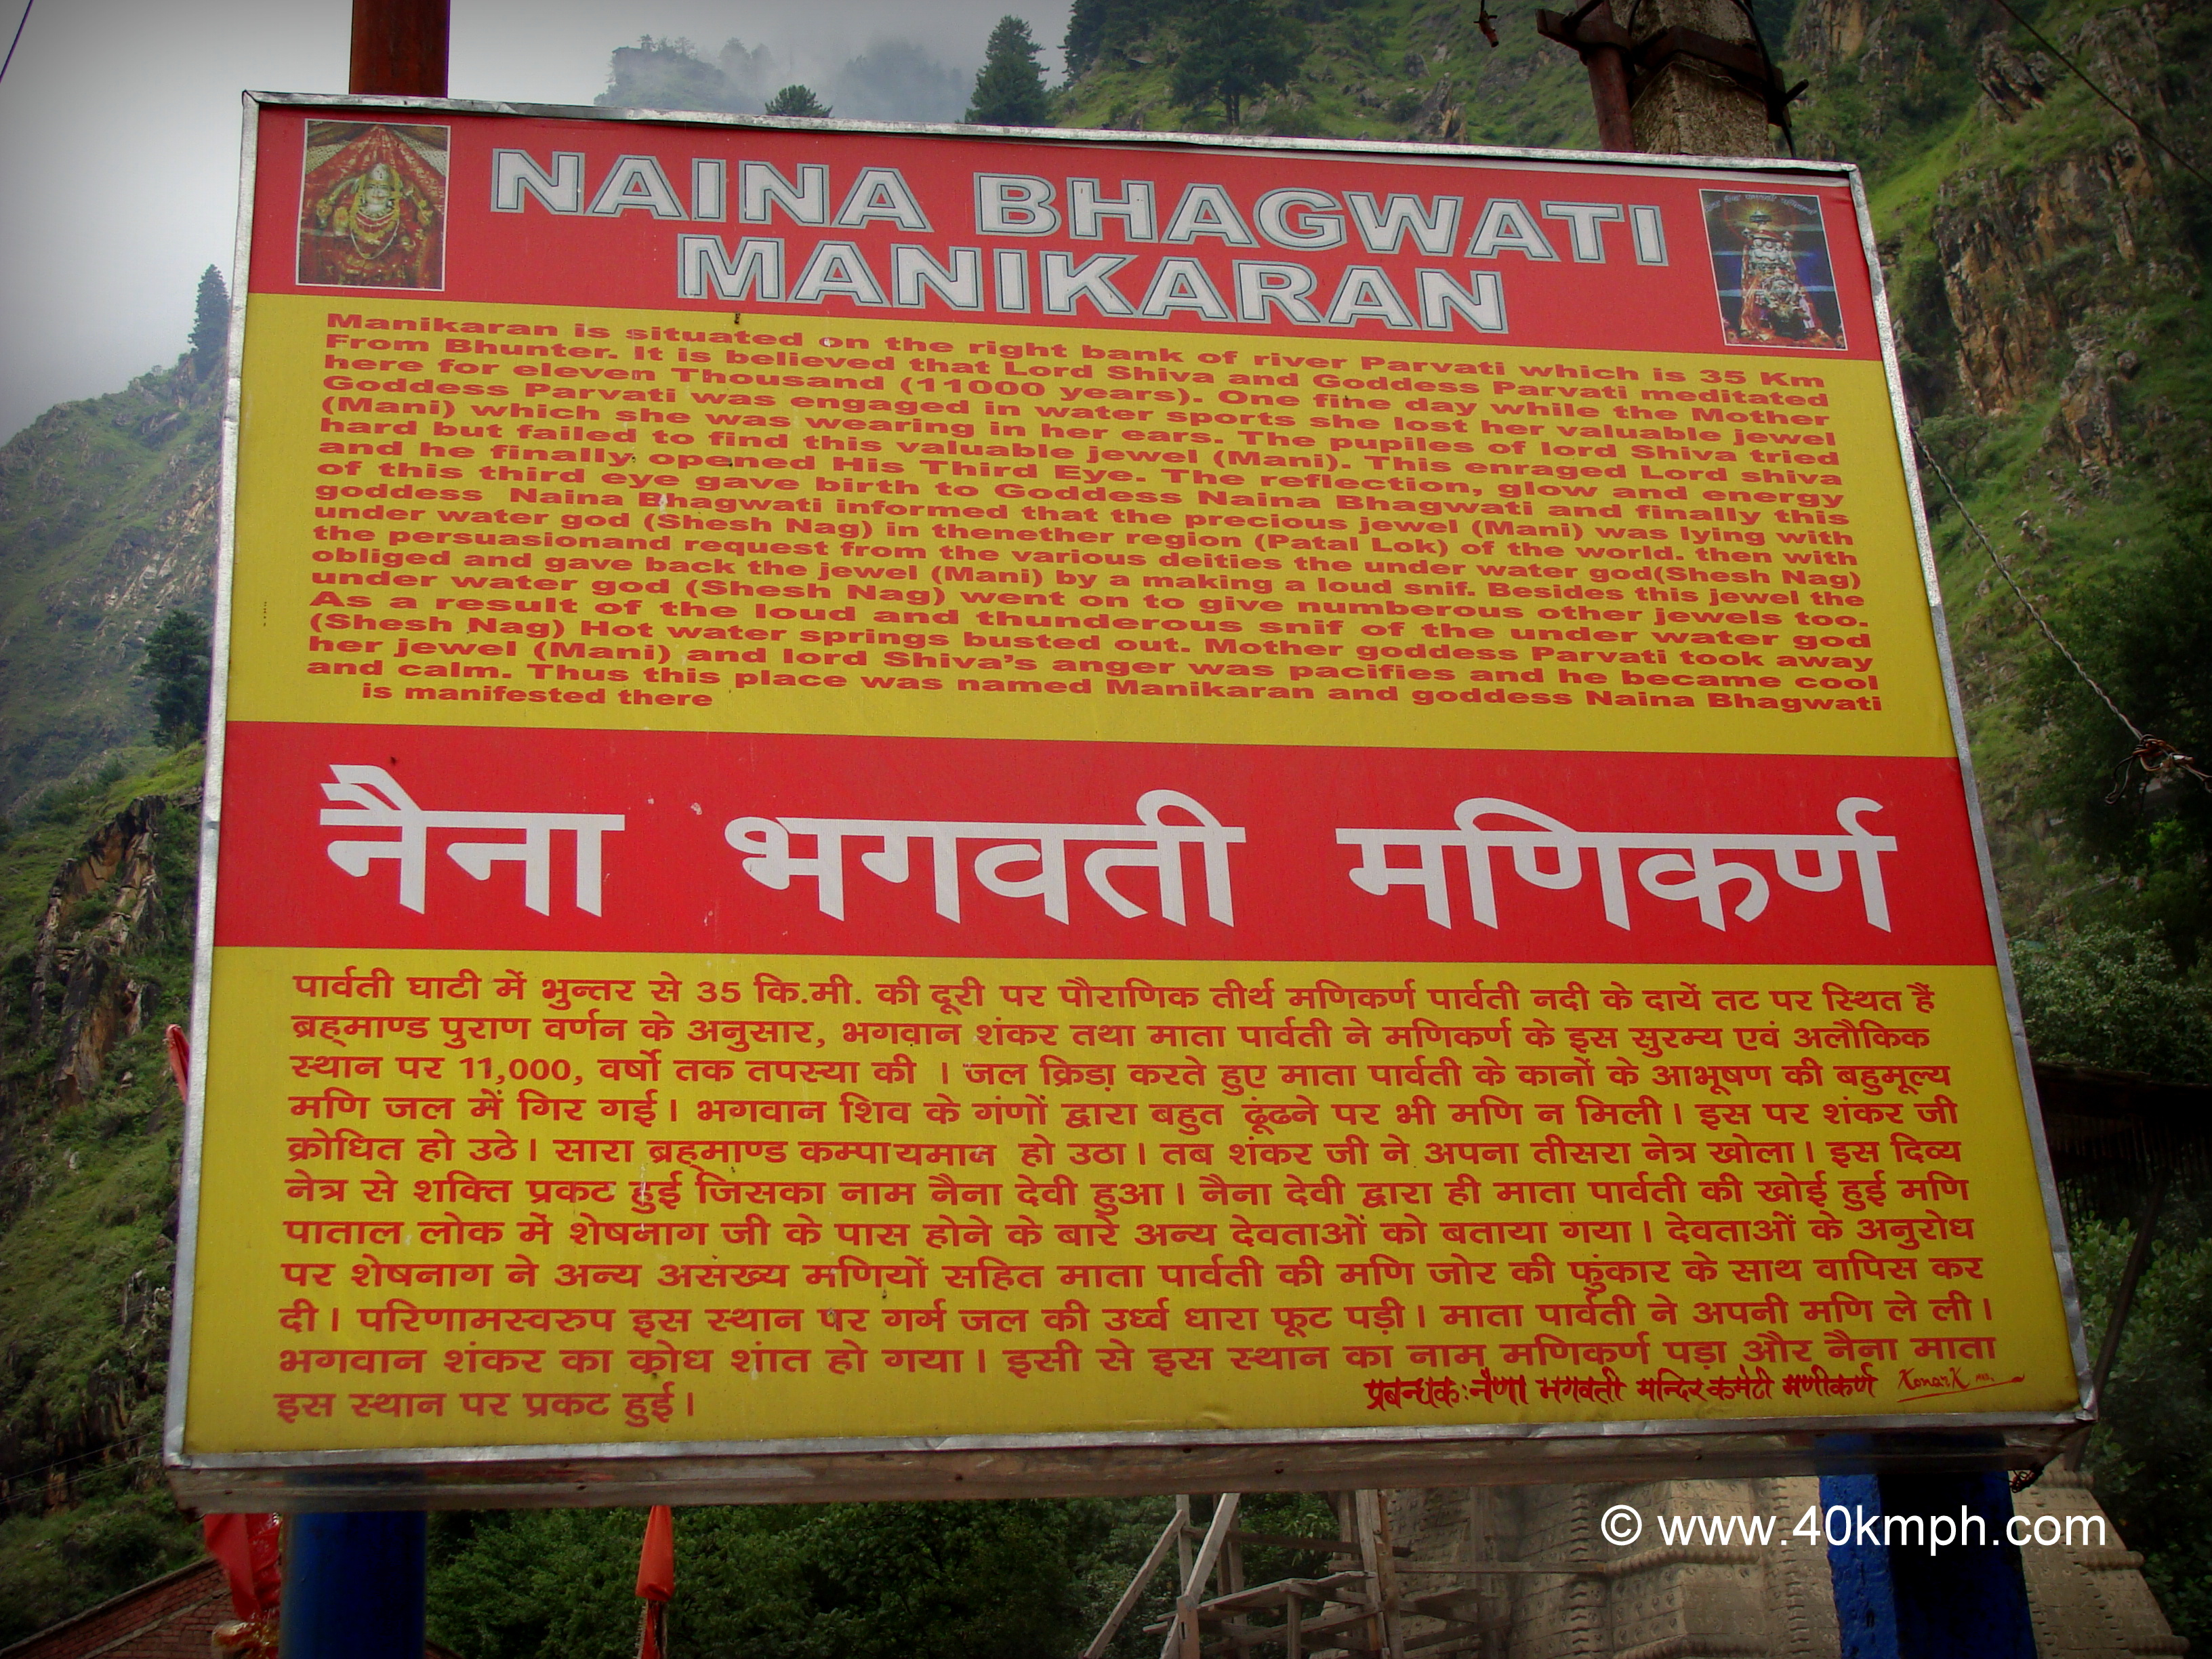 History of Naina Bhagwati Temple, Manikaran, Himachal Pradesh